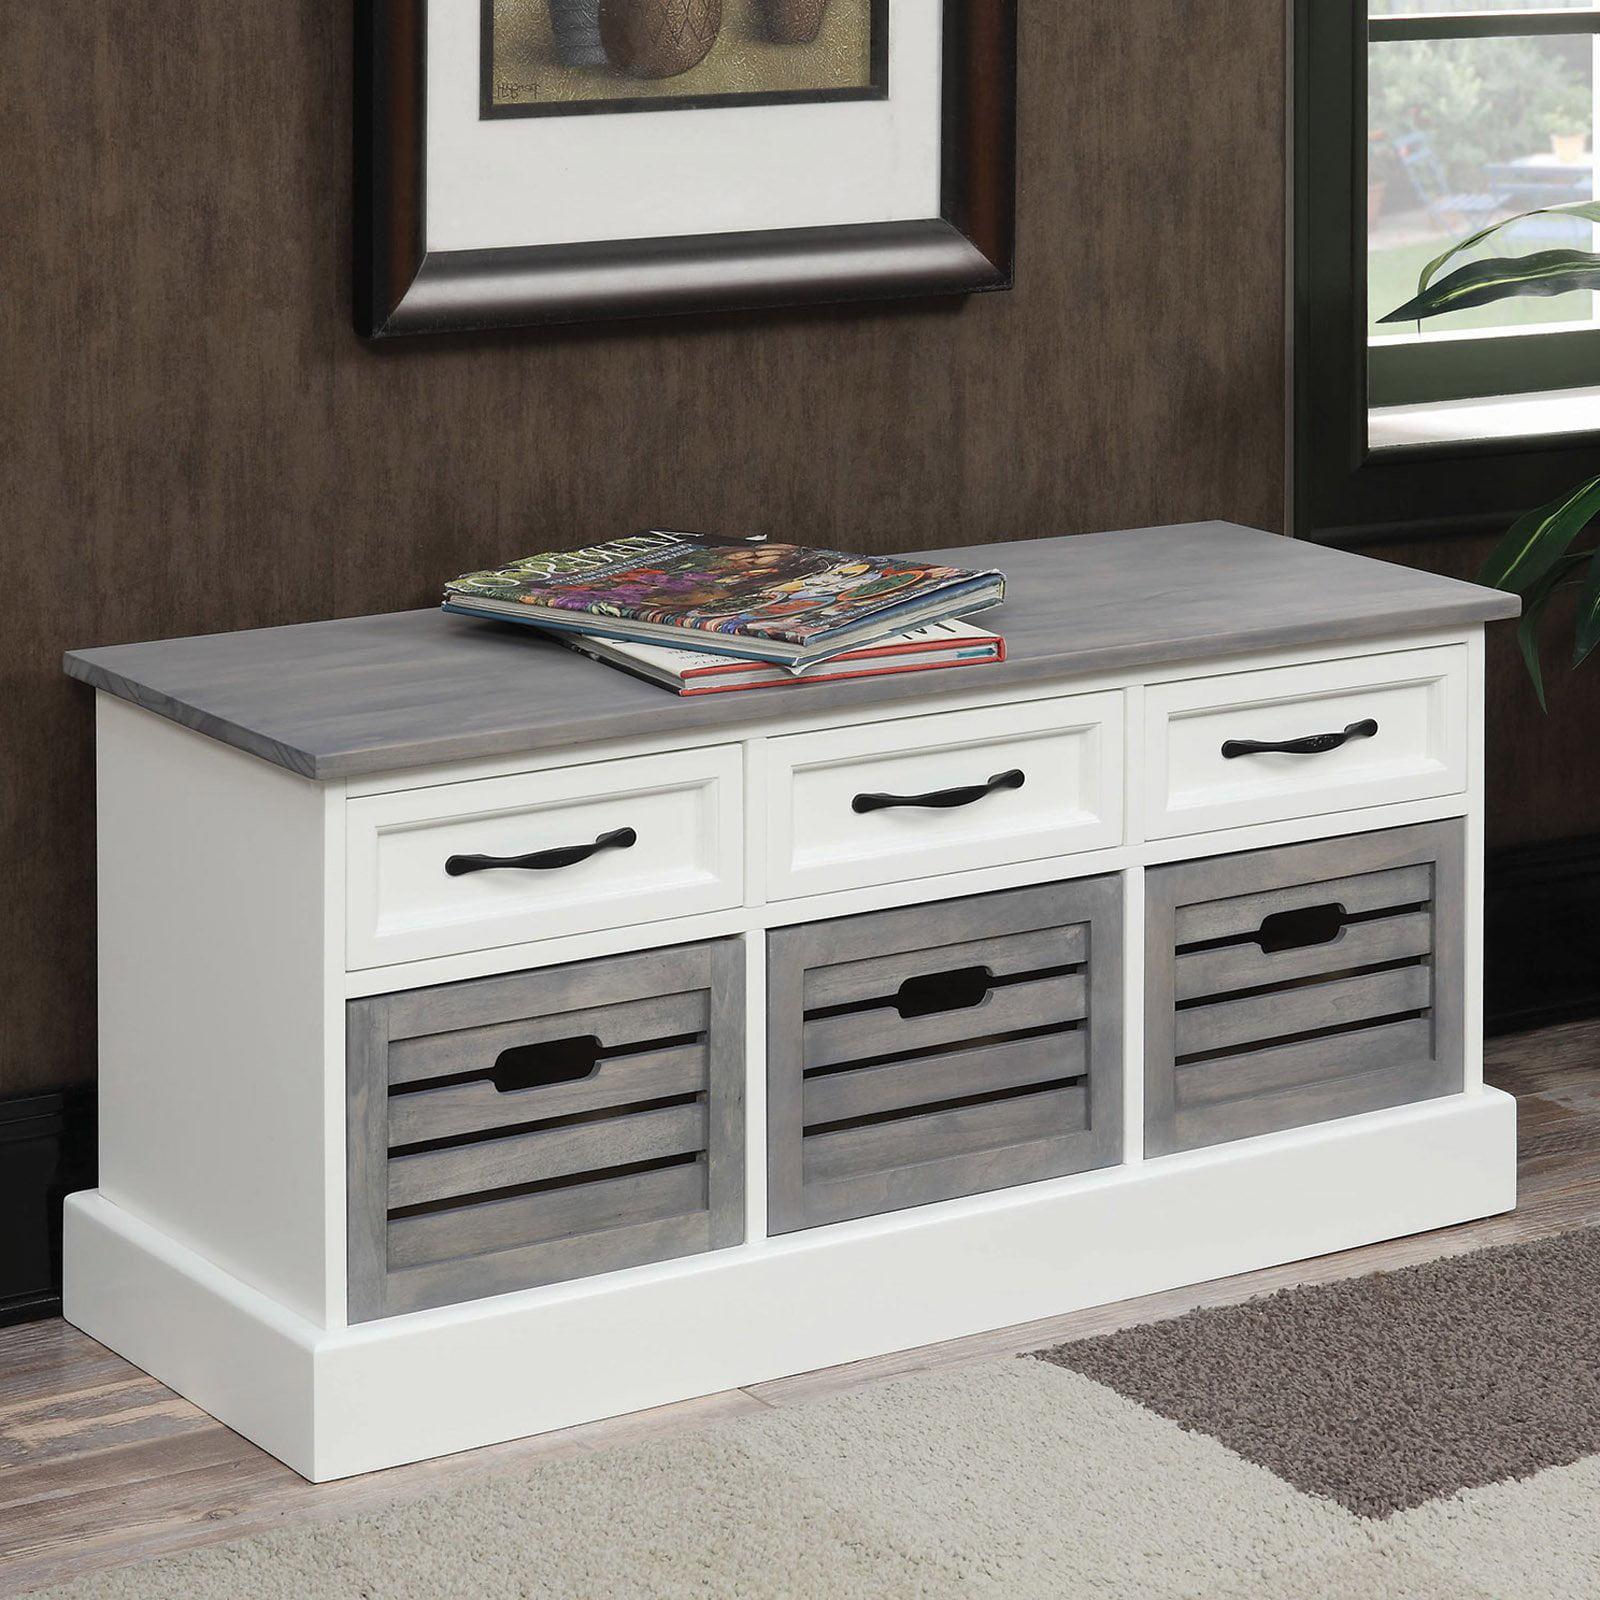 Coaster Company Storage Bench, Weathered Grey and White